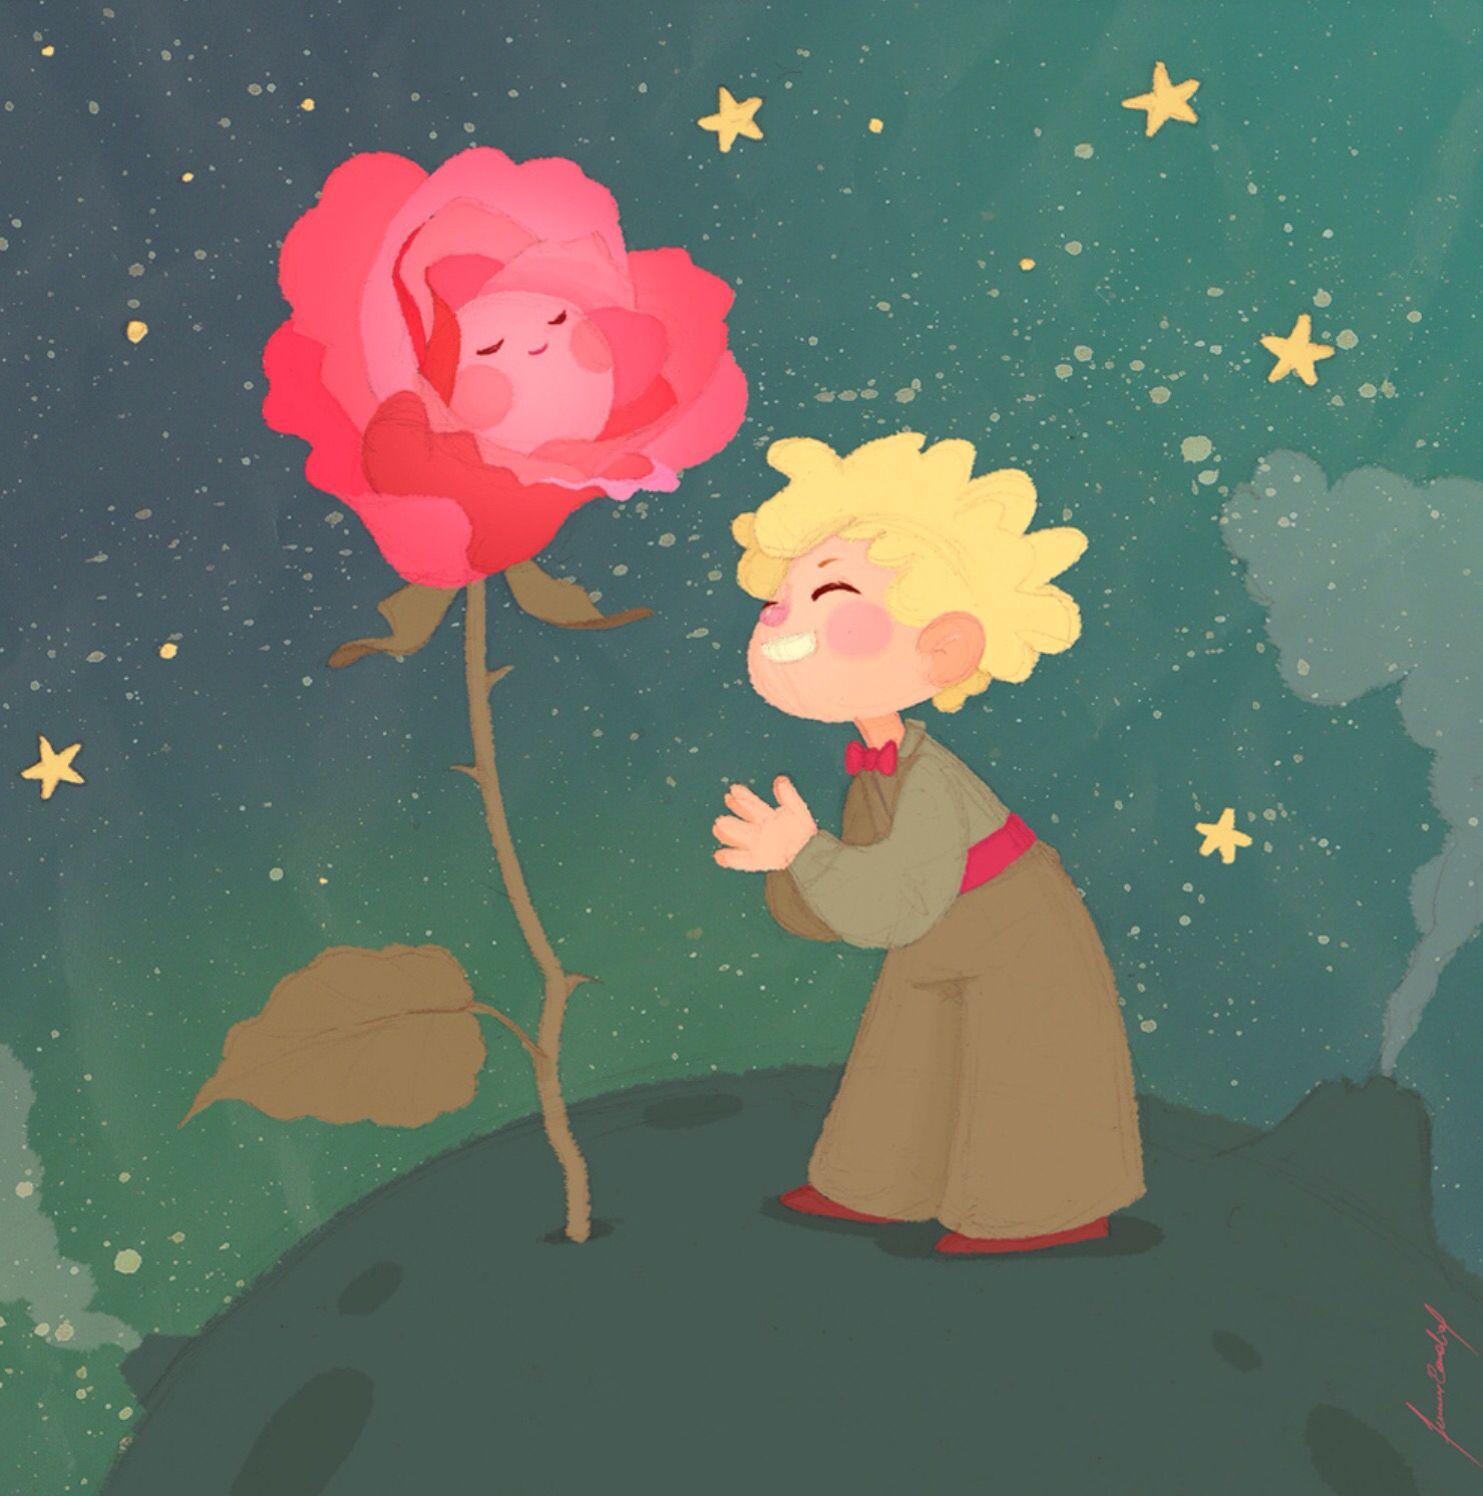 Principito Y Rosa The Little Prince El Principito Rosa Del